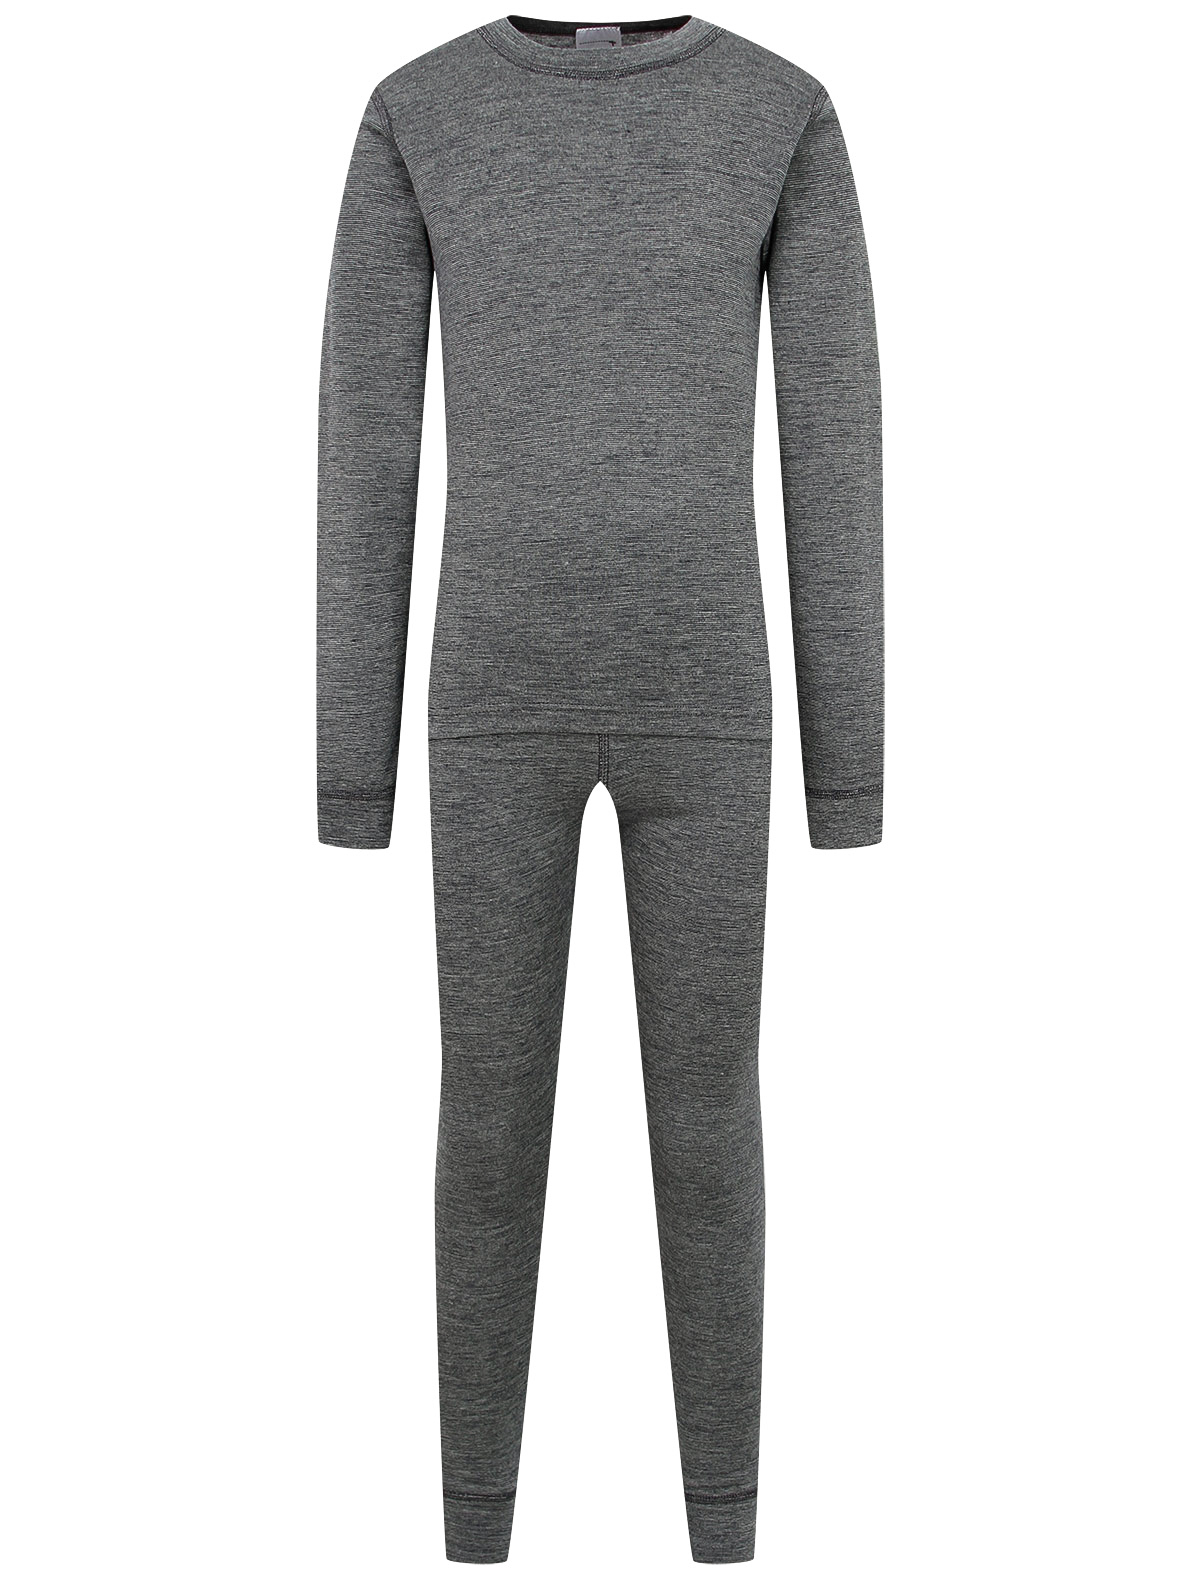 Купить 2256818, Термобелье Air wool, серый, 1724529080075